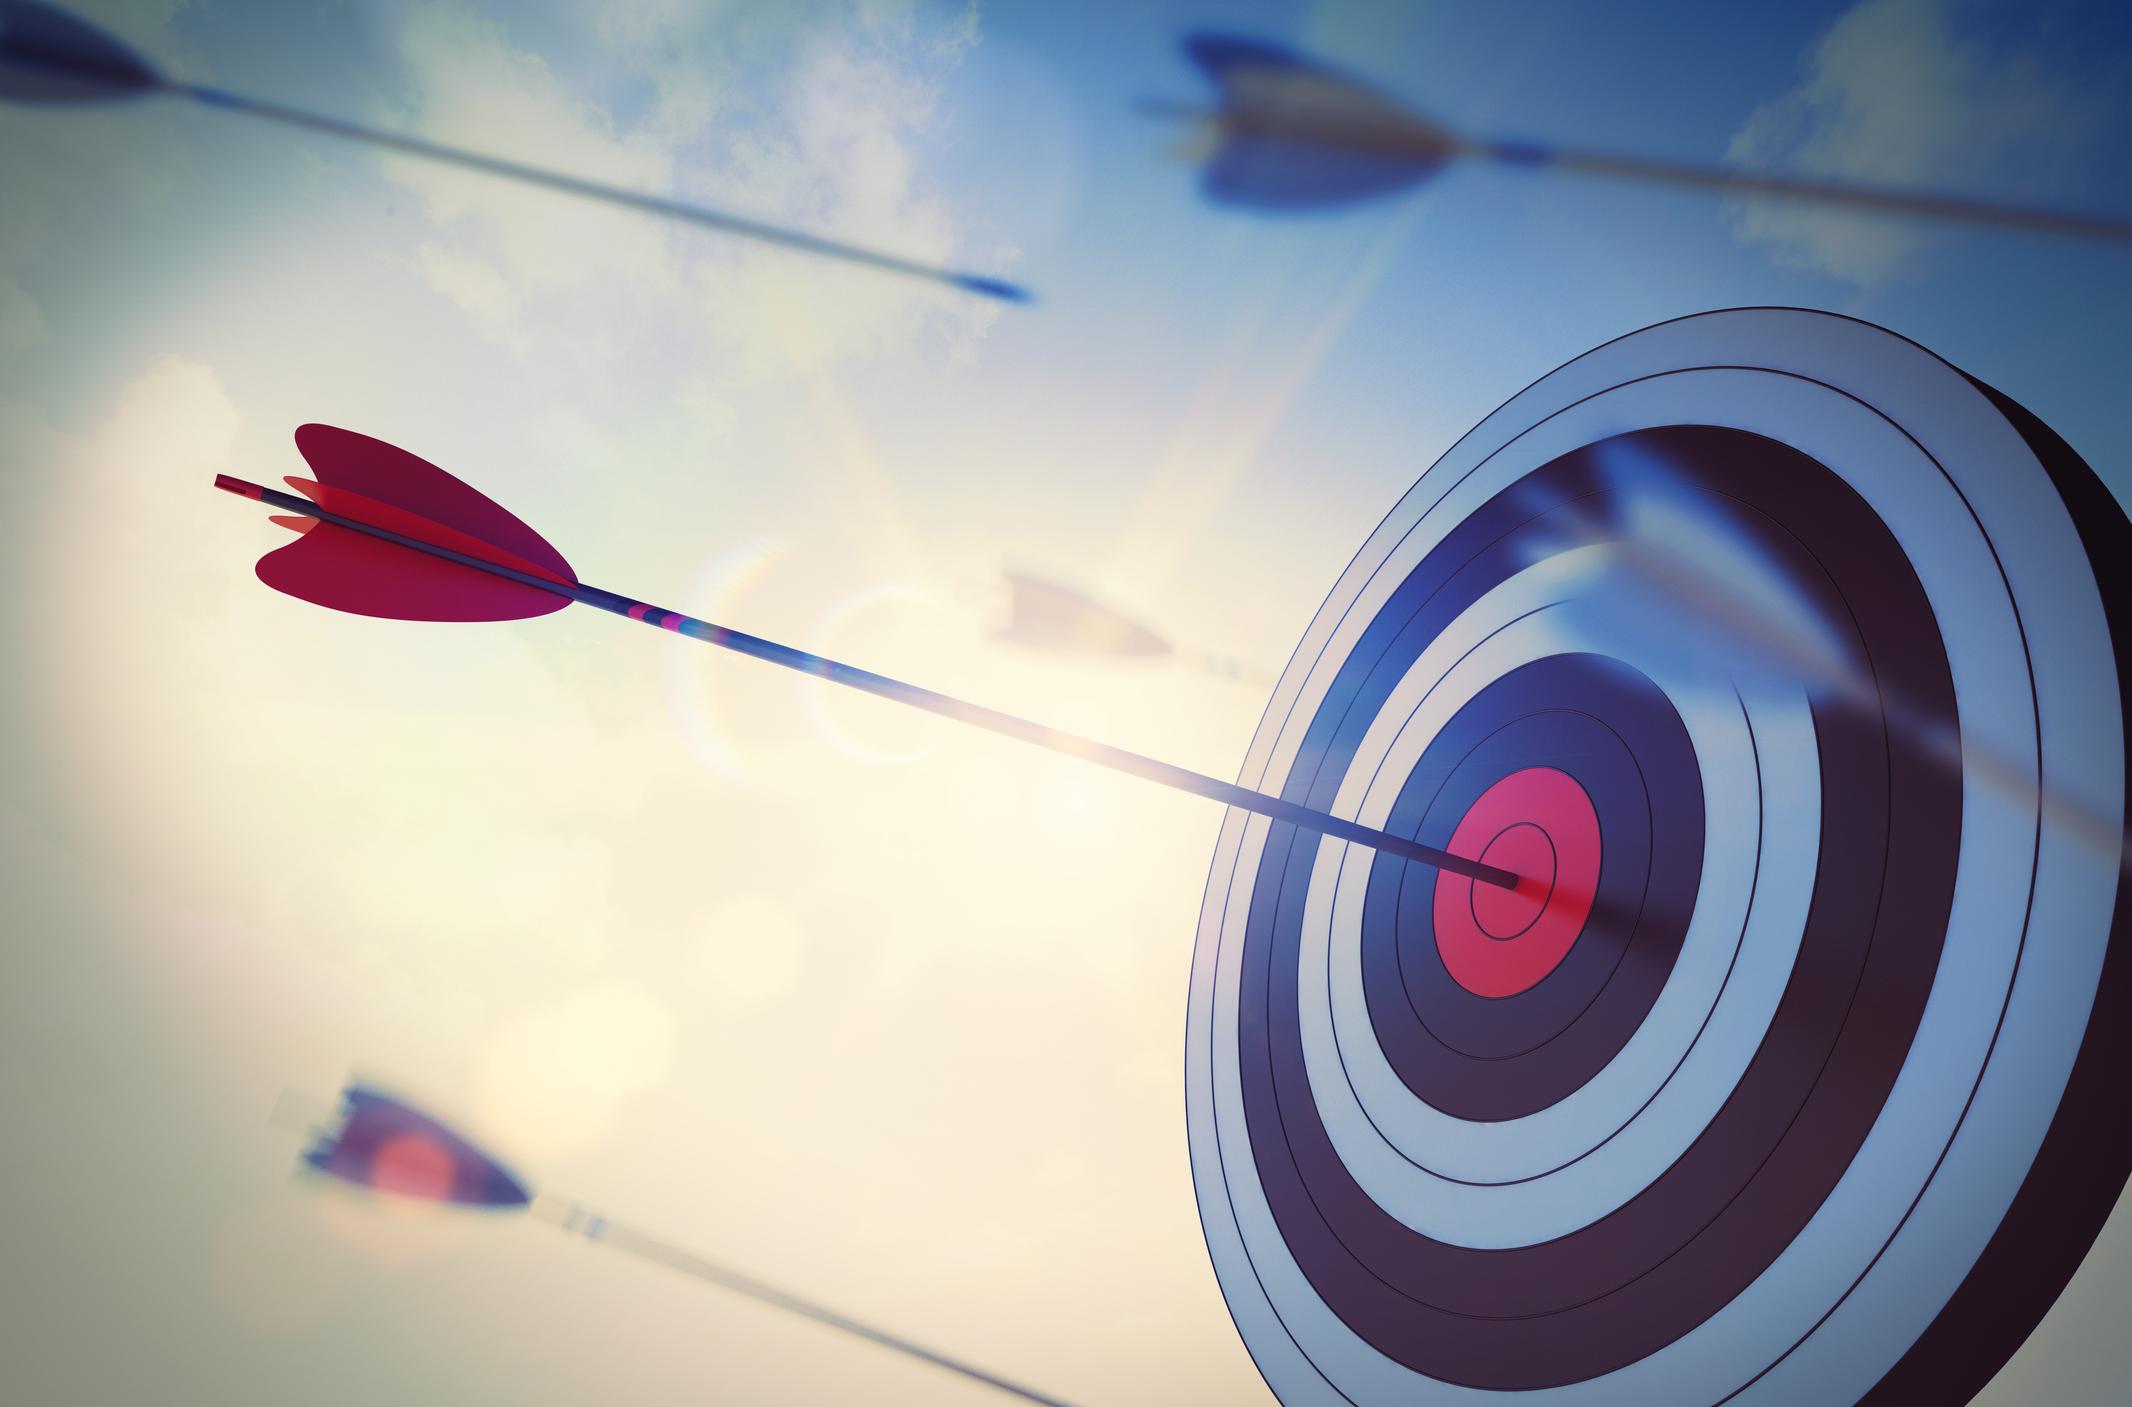 An arrow in the bulls eye of a target.